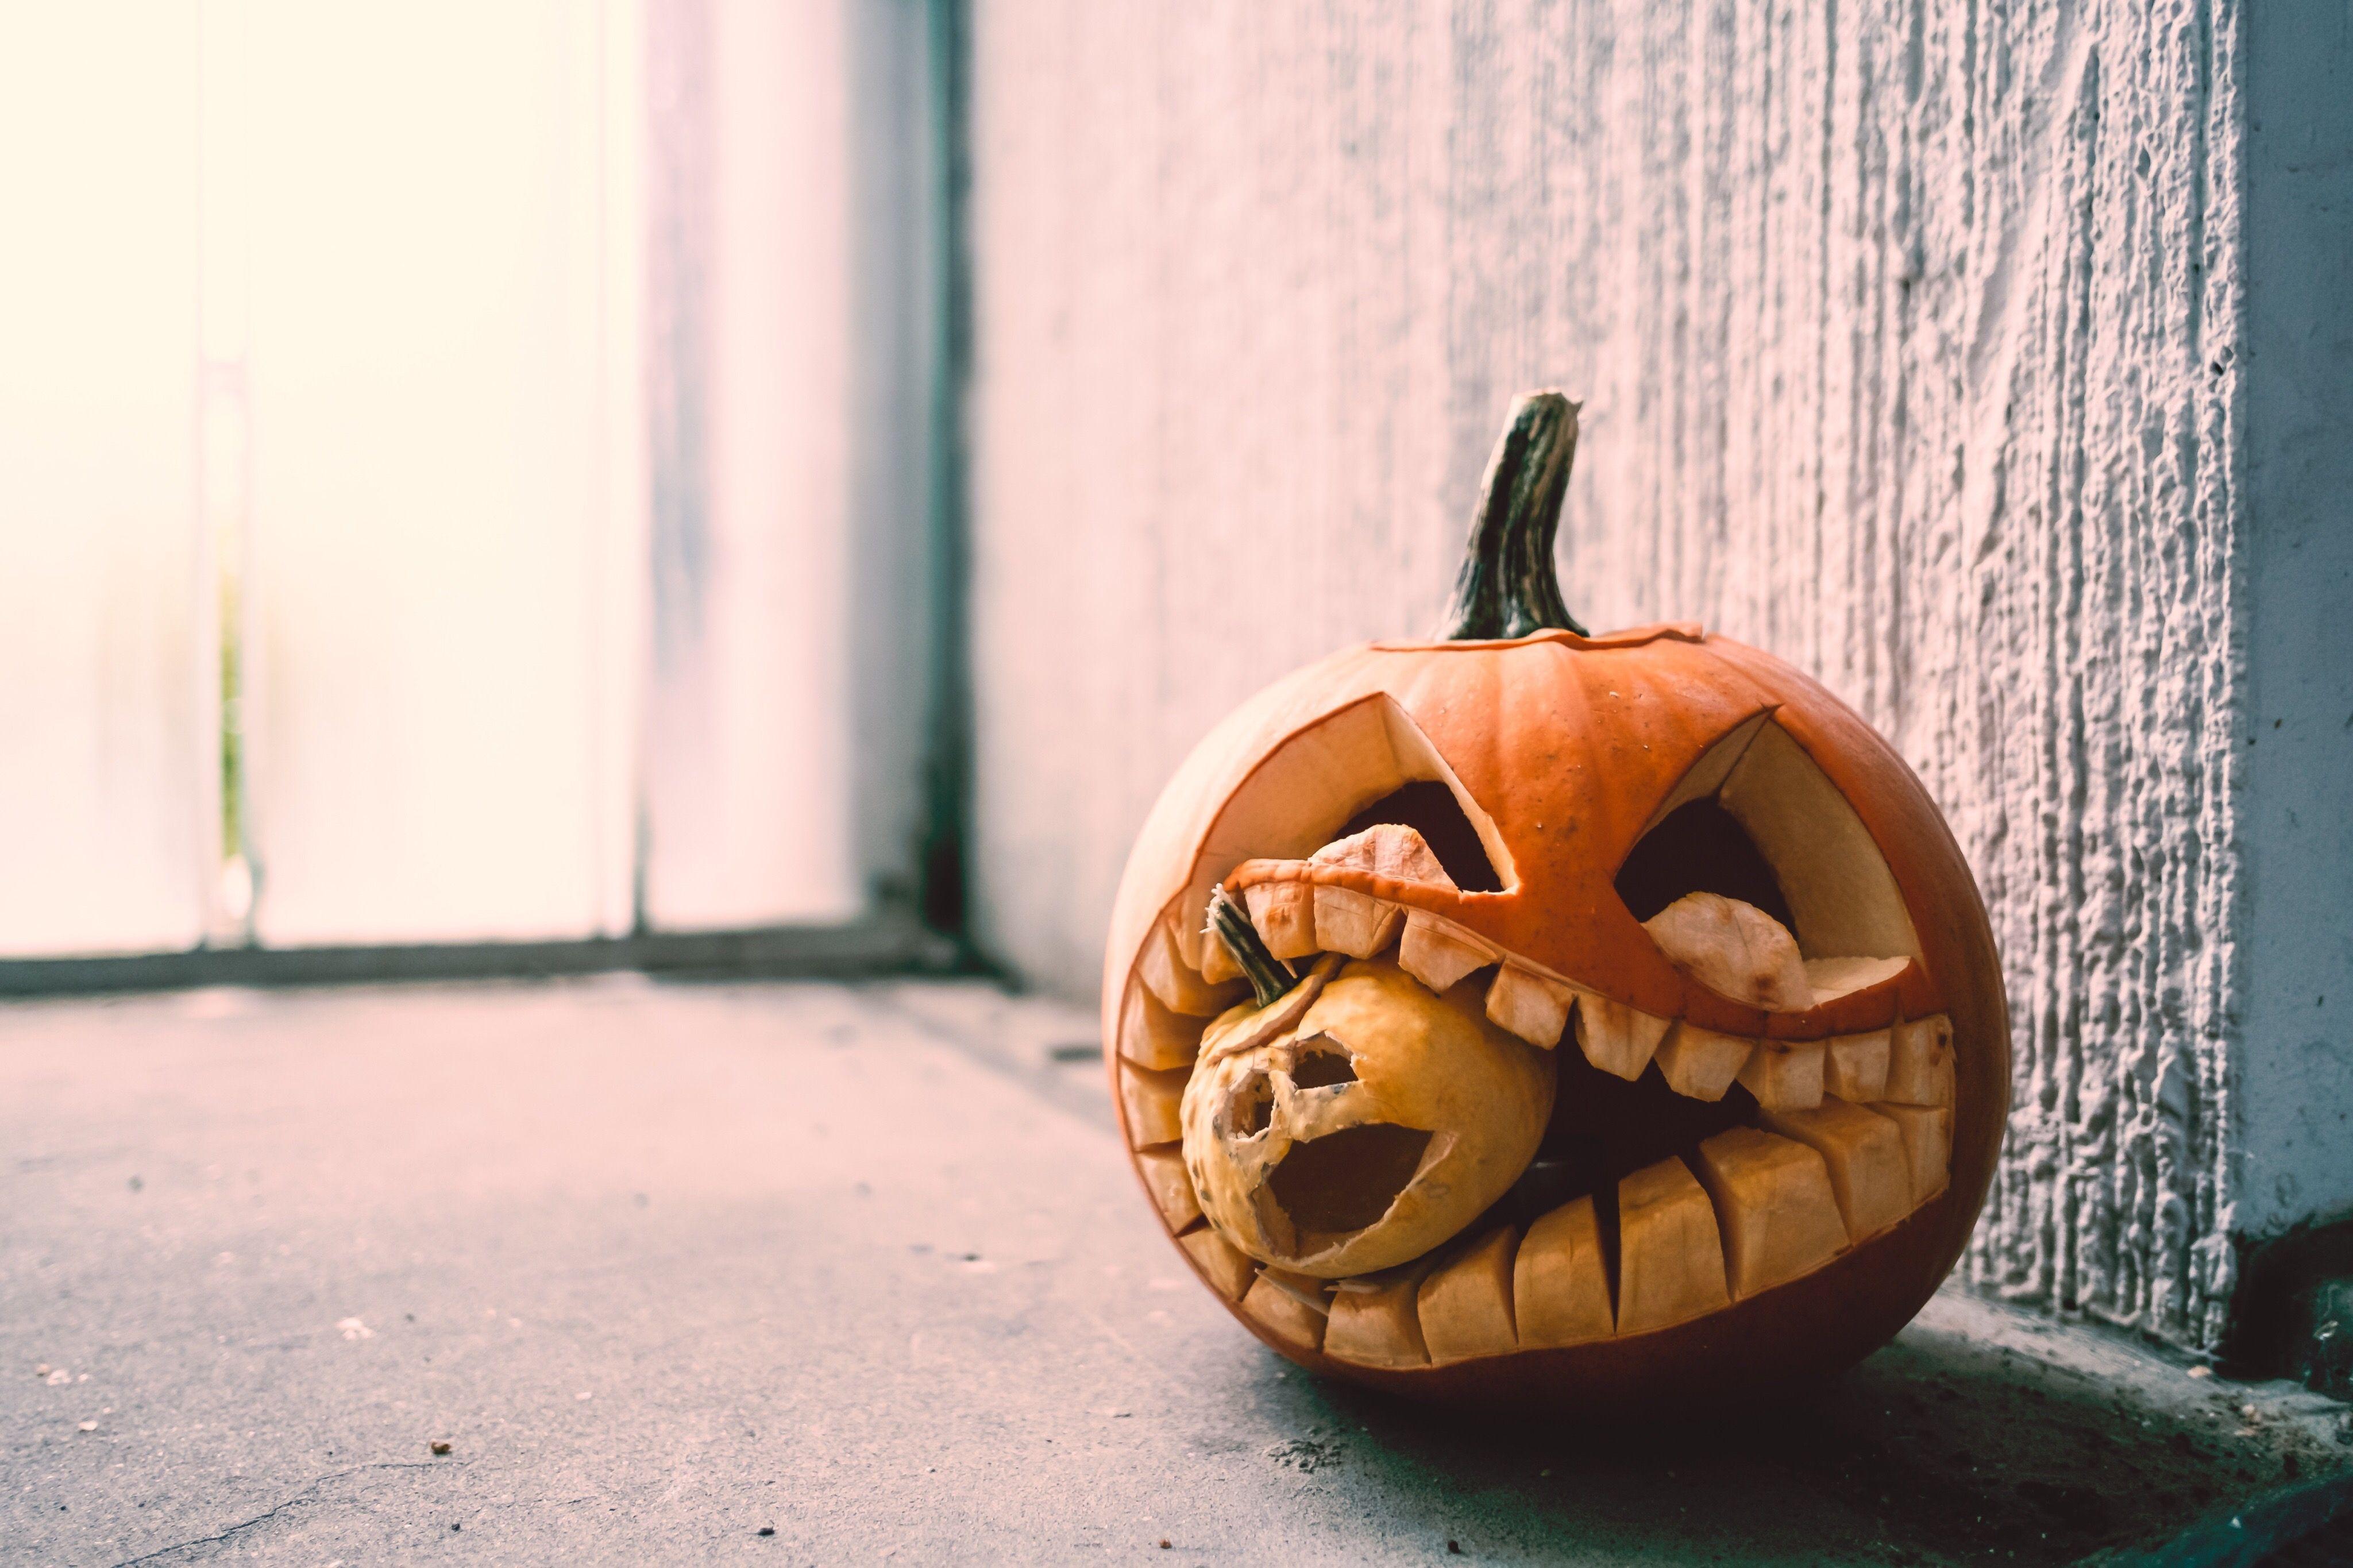 52 Cool Pumpkin Carving Designs Creative Ideas For Jack O Lanterns